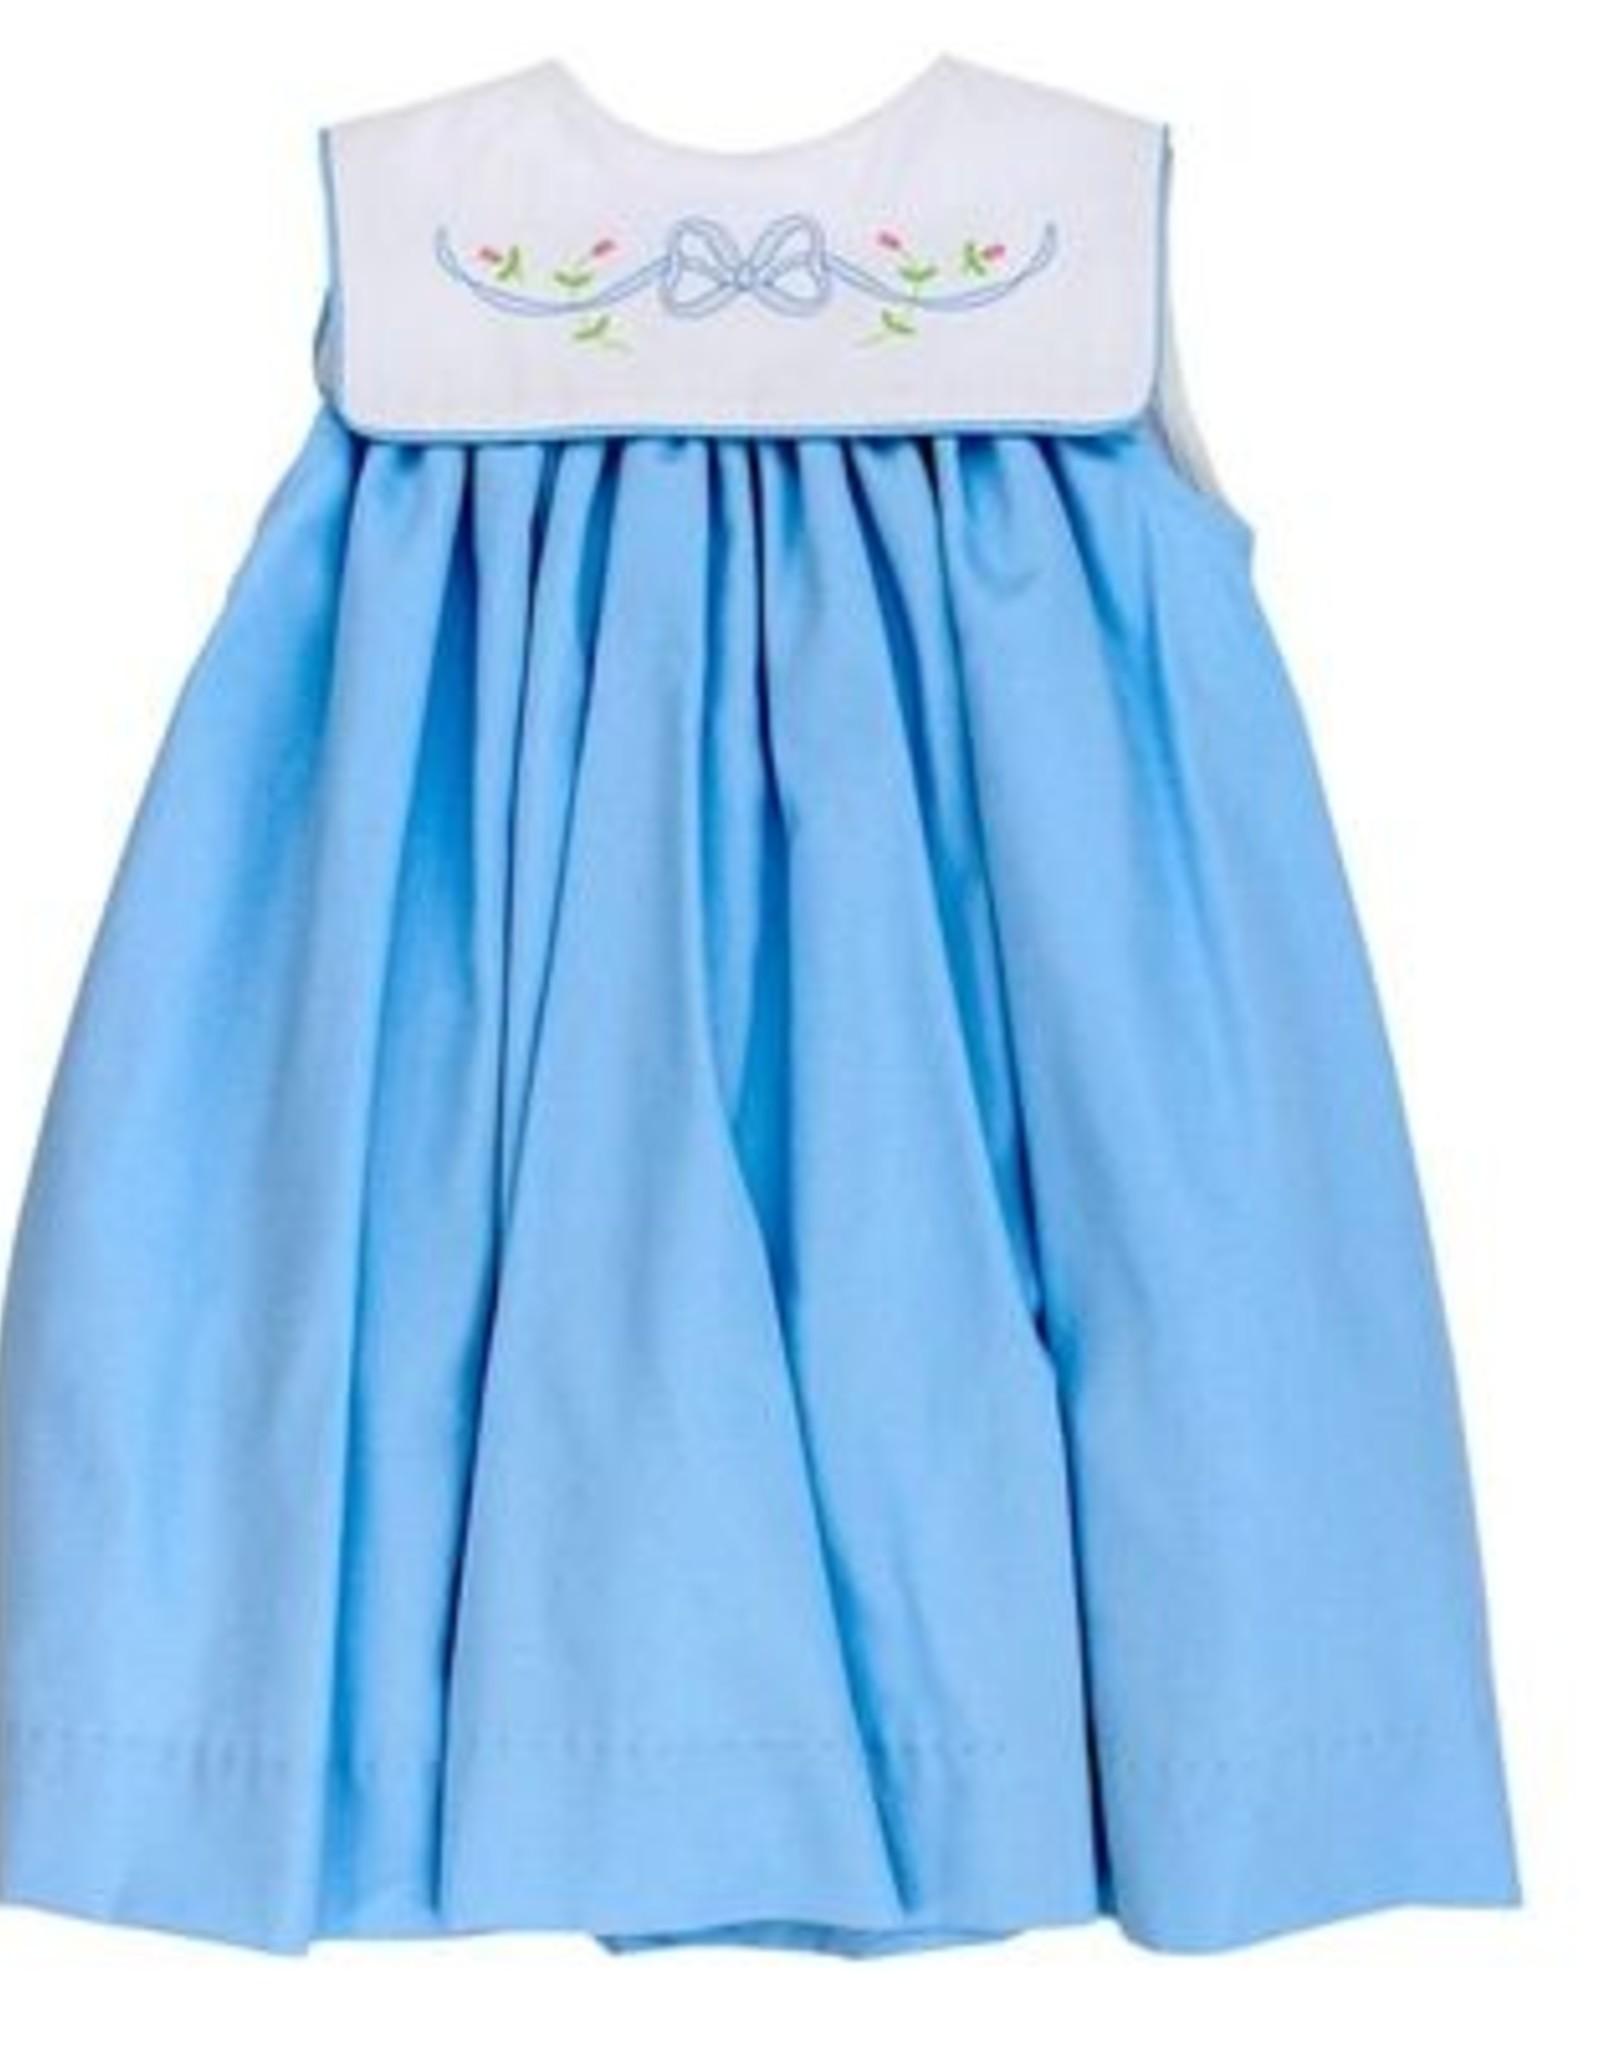 The Bailey Boys Blue Bonnet Float Dress